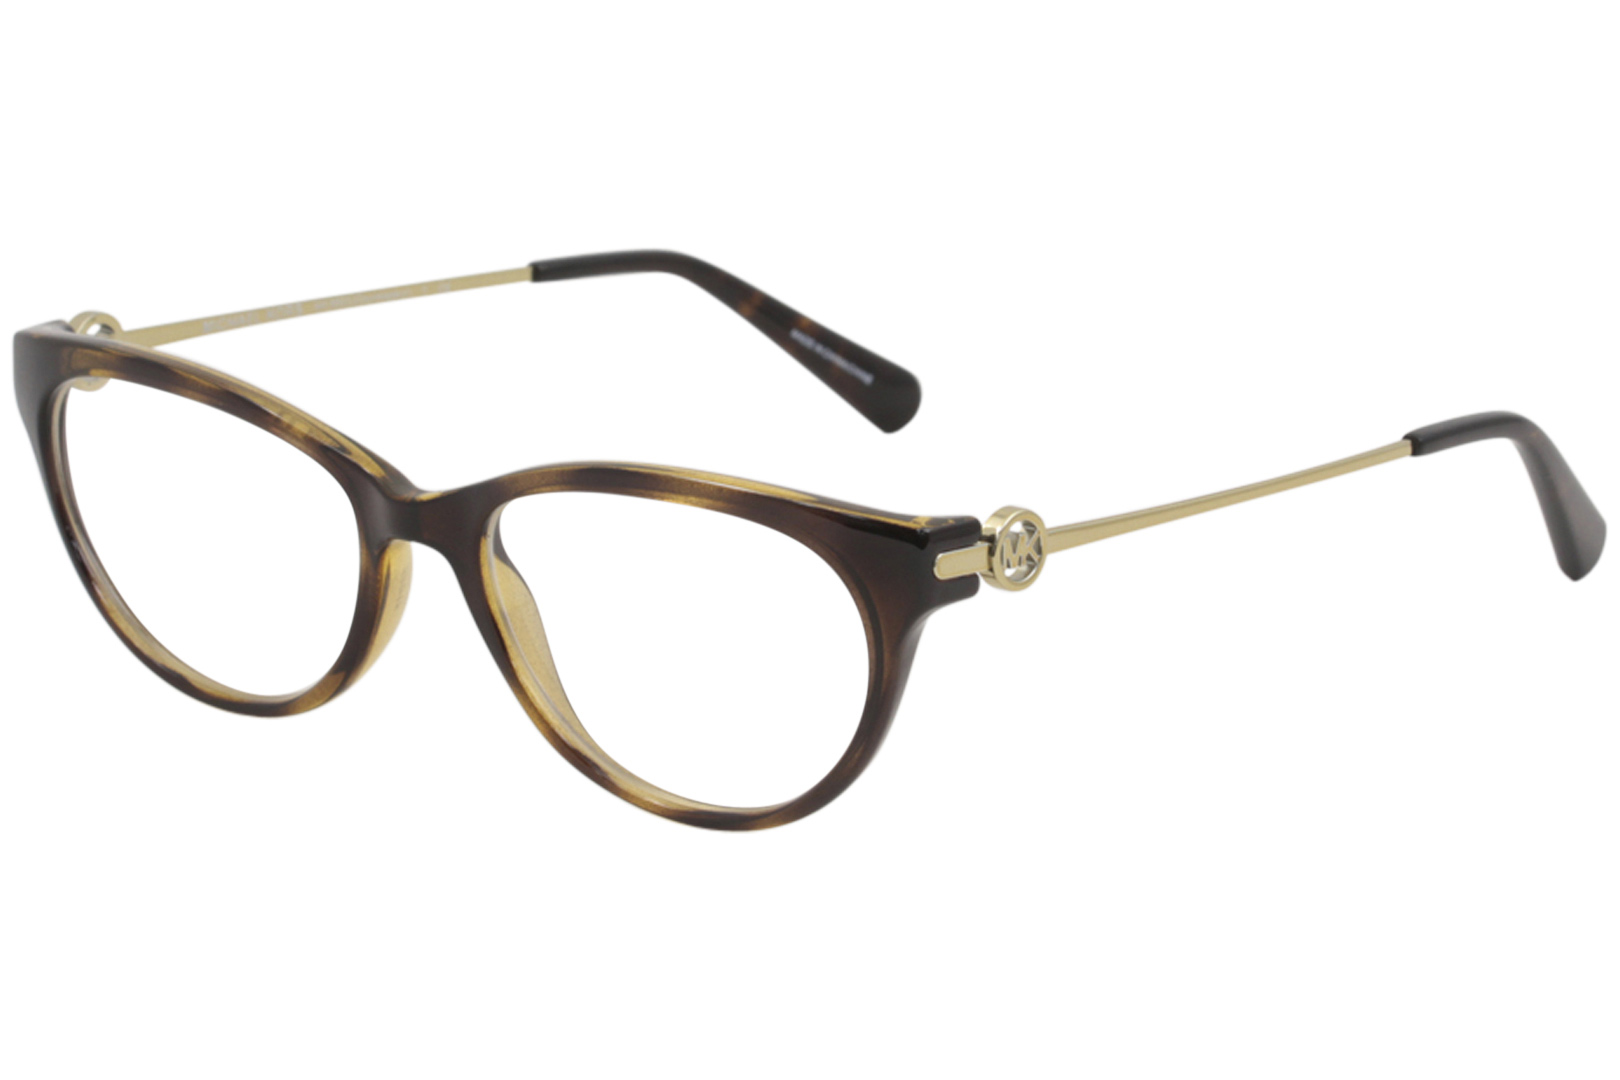 Michael Kors Eyeglasses Courmayeur MK8003 8003 3006 Tortoise Optical ... ca7b623cc4